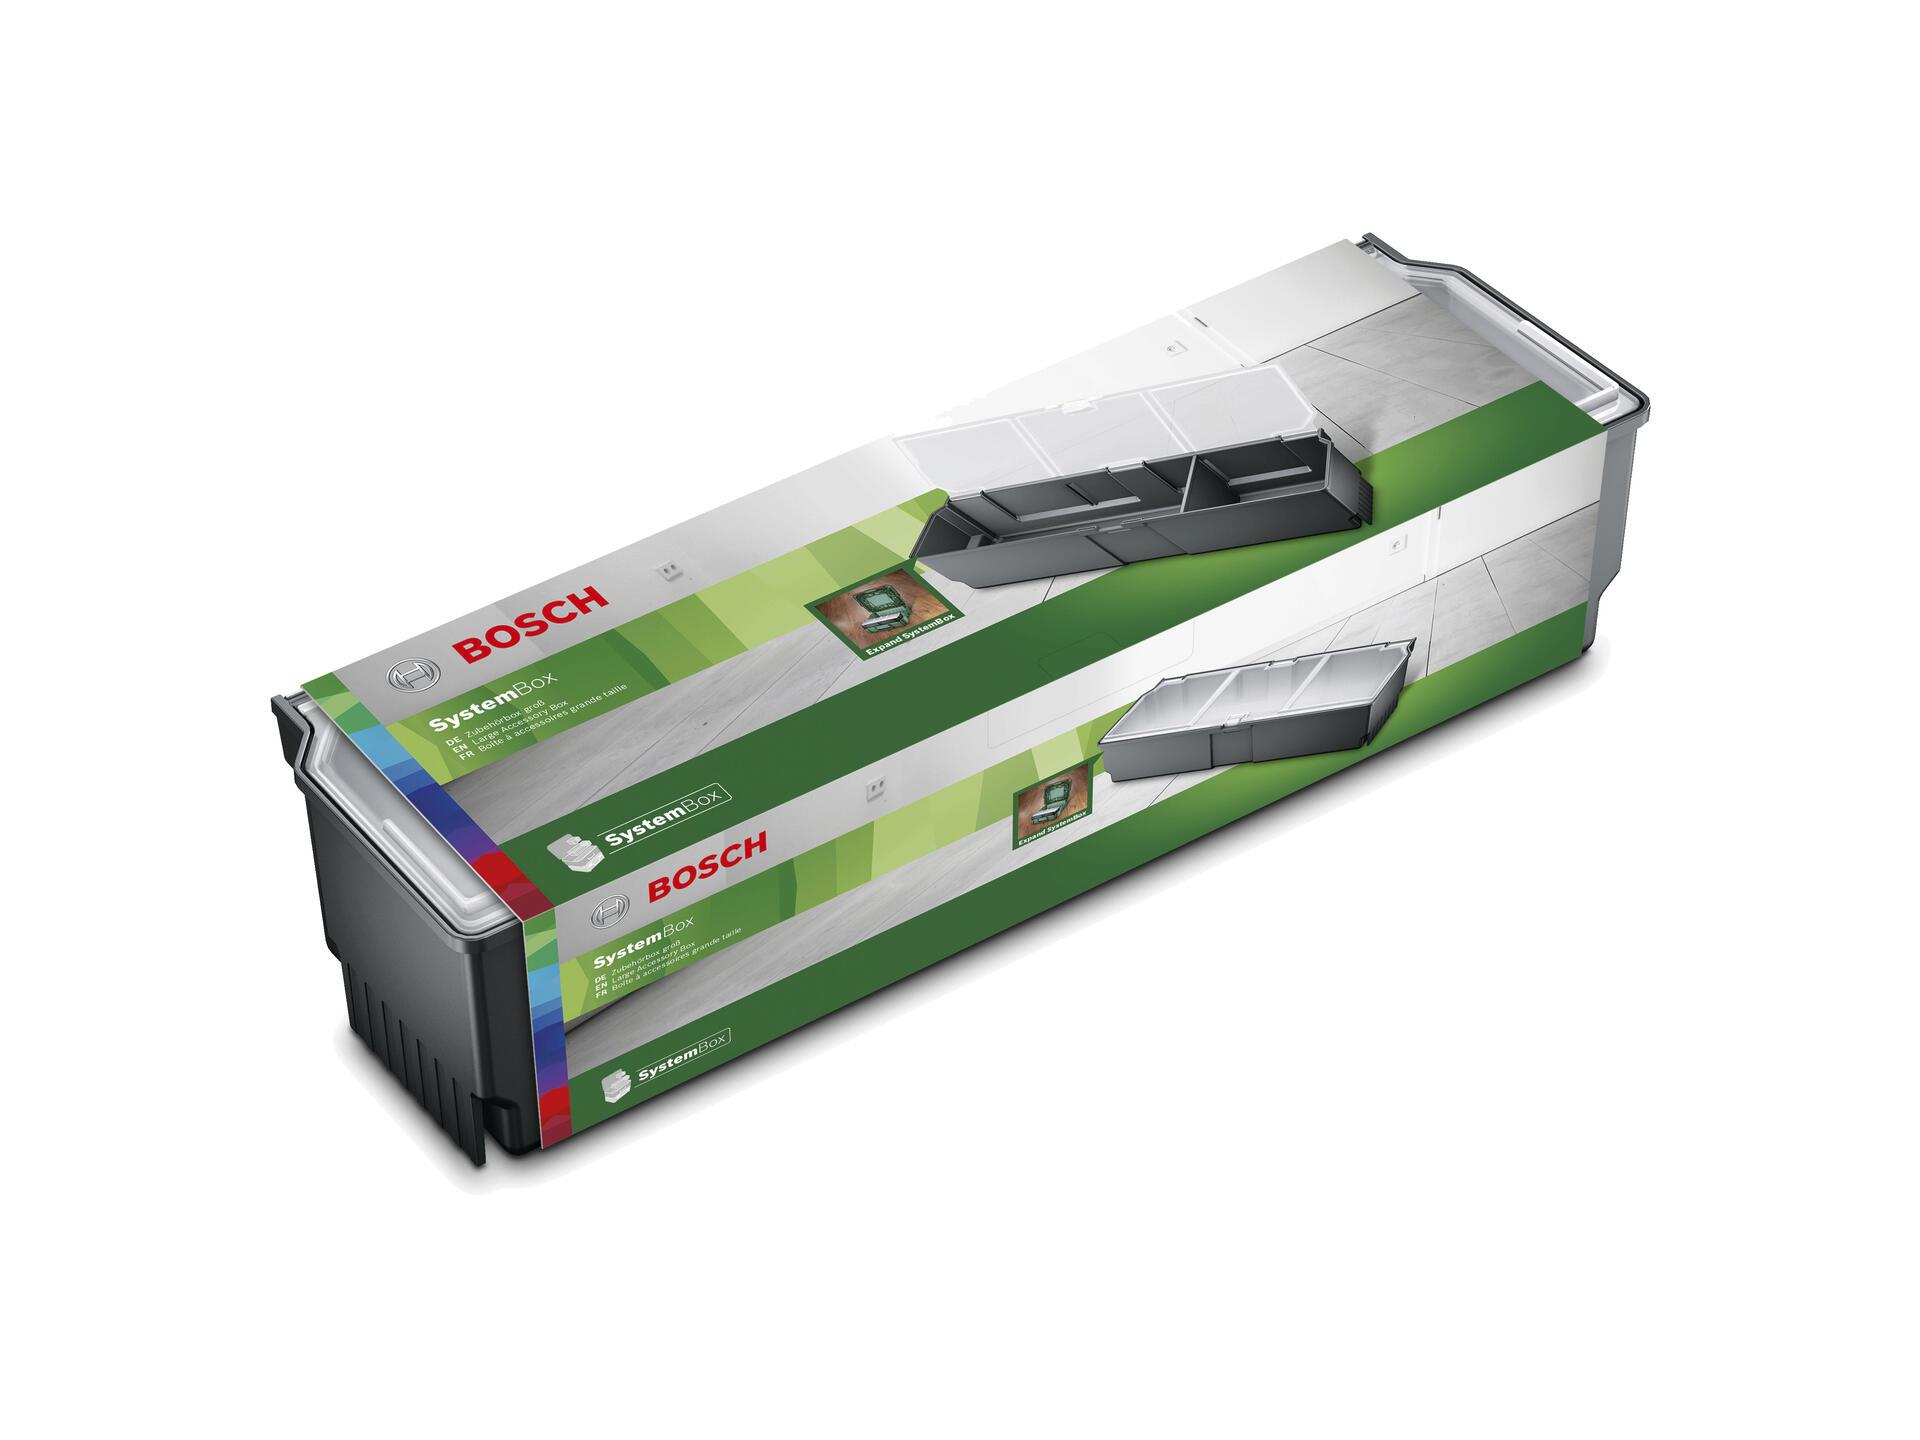 Bosch SystemBox boîte à accessoires grand modèle | Hubo